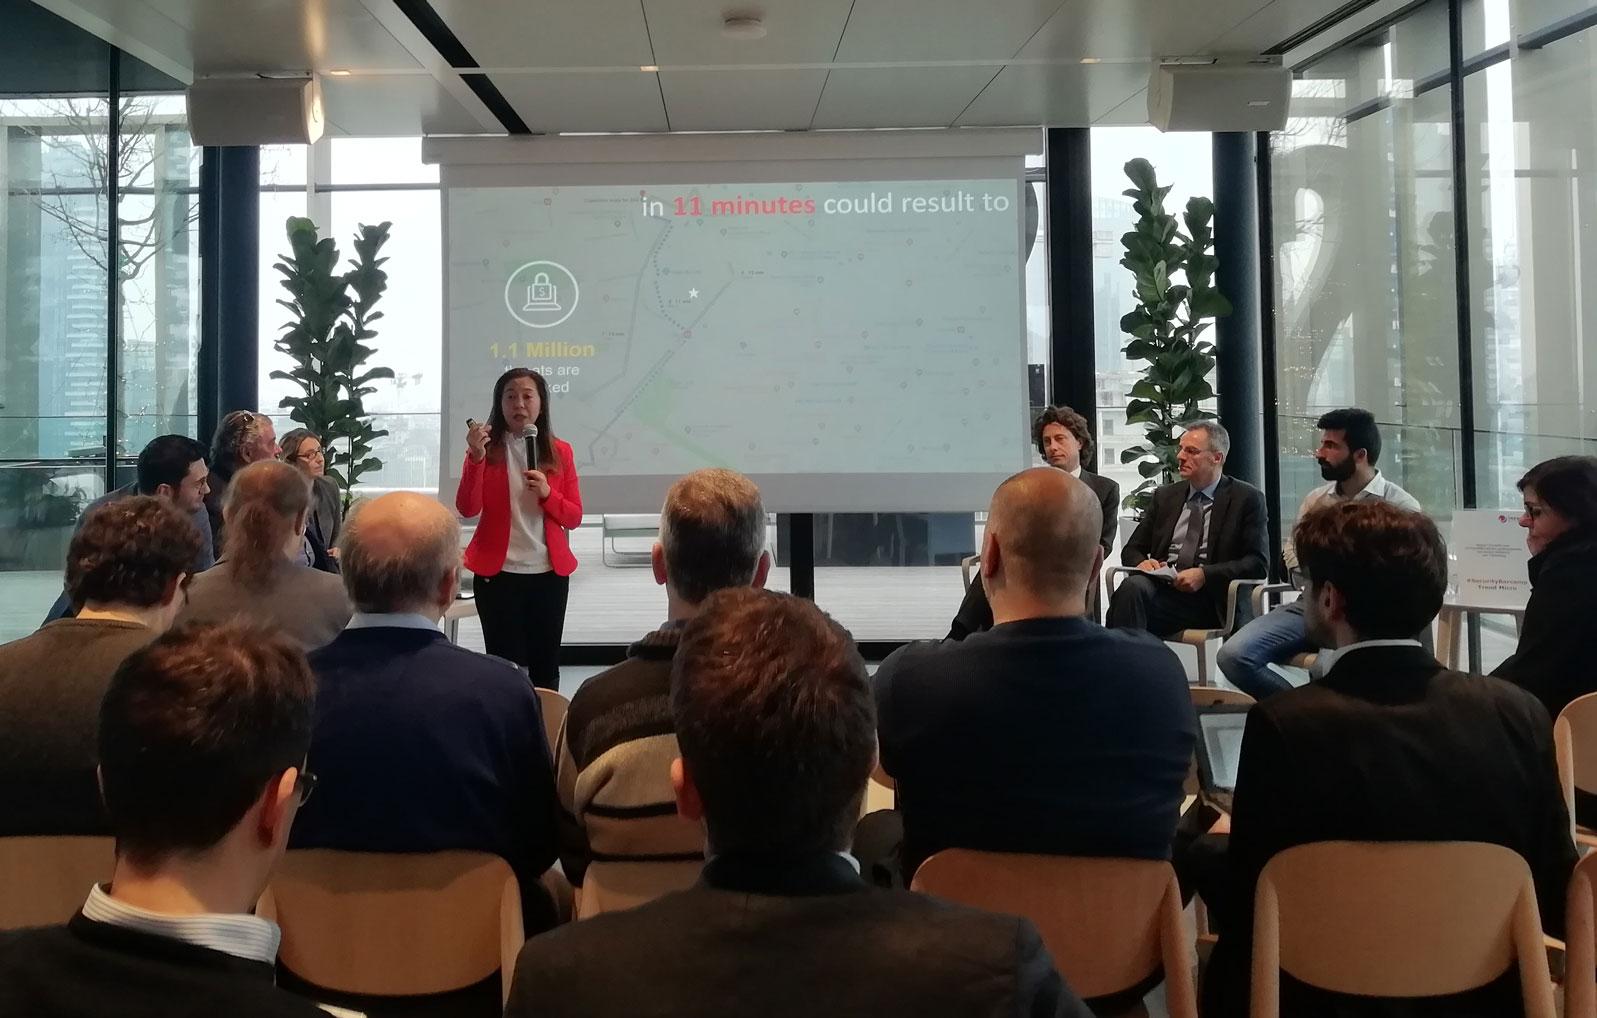 Myla Pilao, Director Technical Marketing, Trend Micro